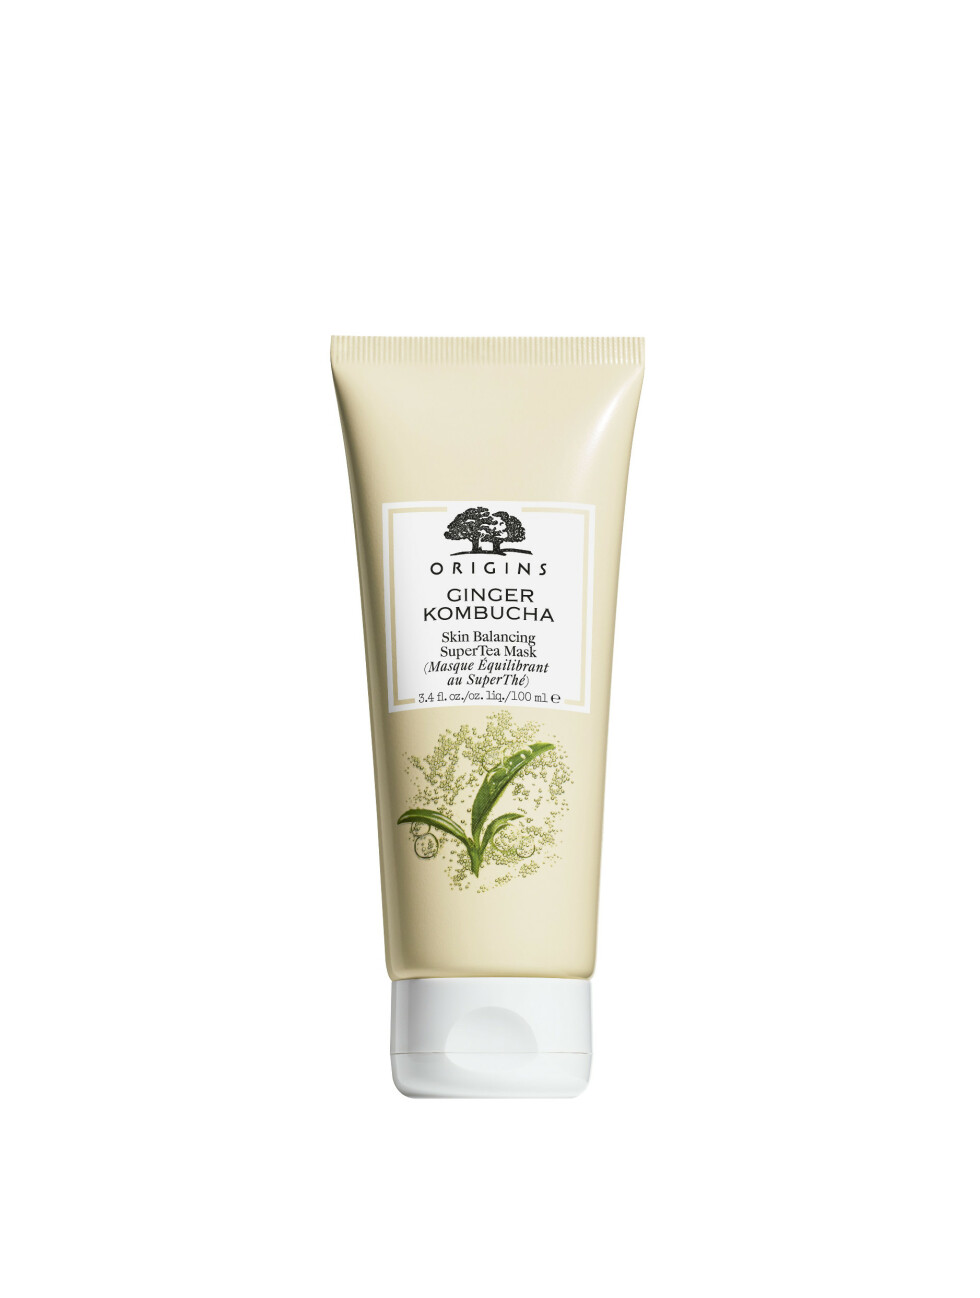 1. Renser porer og fjerner overflødig olje med ingefær og te (kr 225, Origins, Ginger Kombucha, Skin Balancing Super Tea Mask).